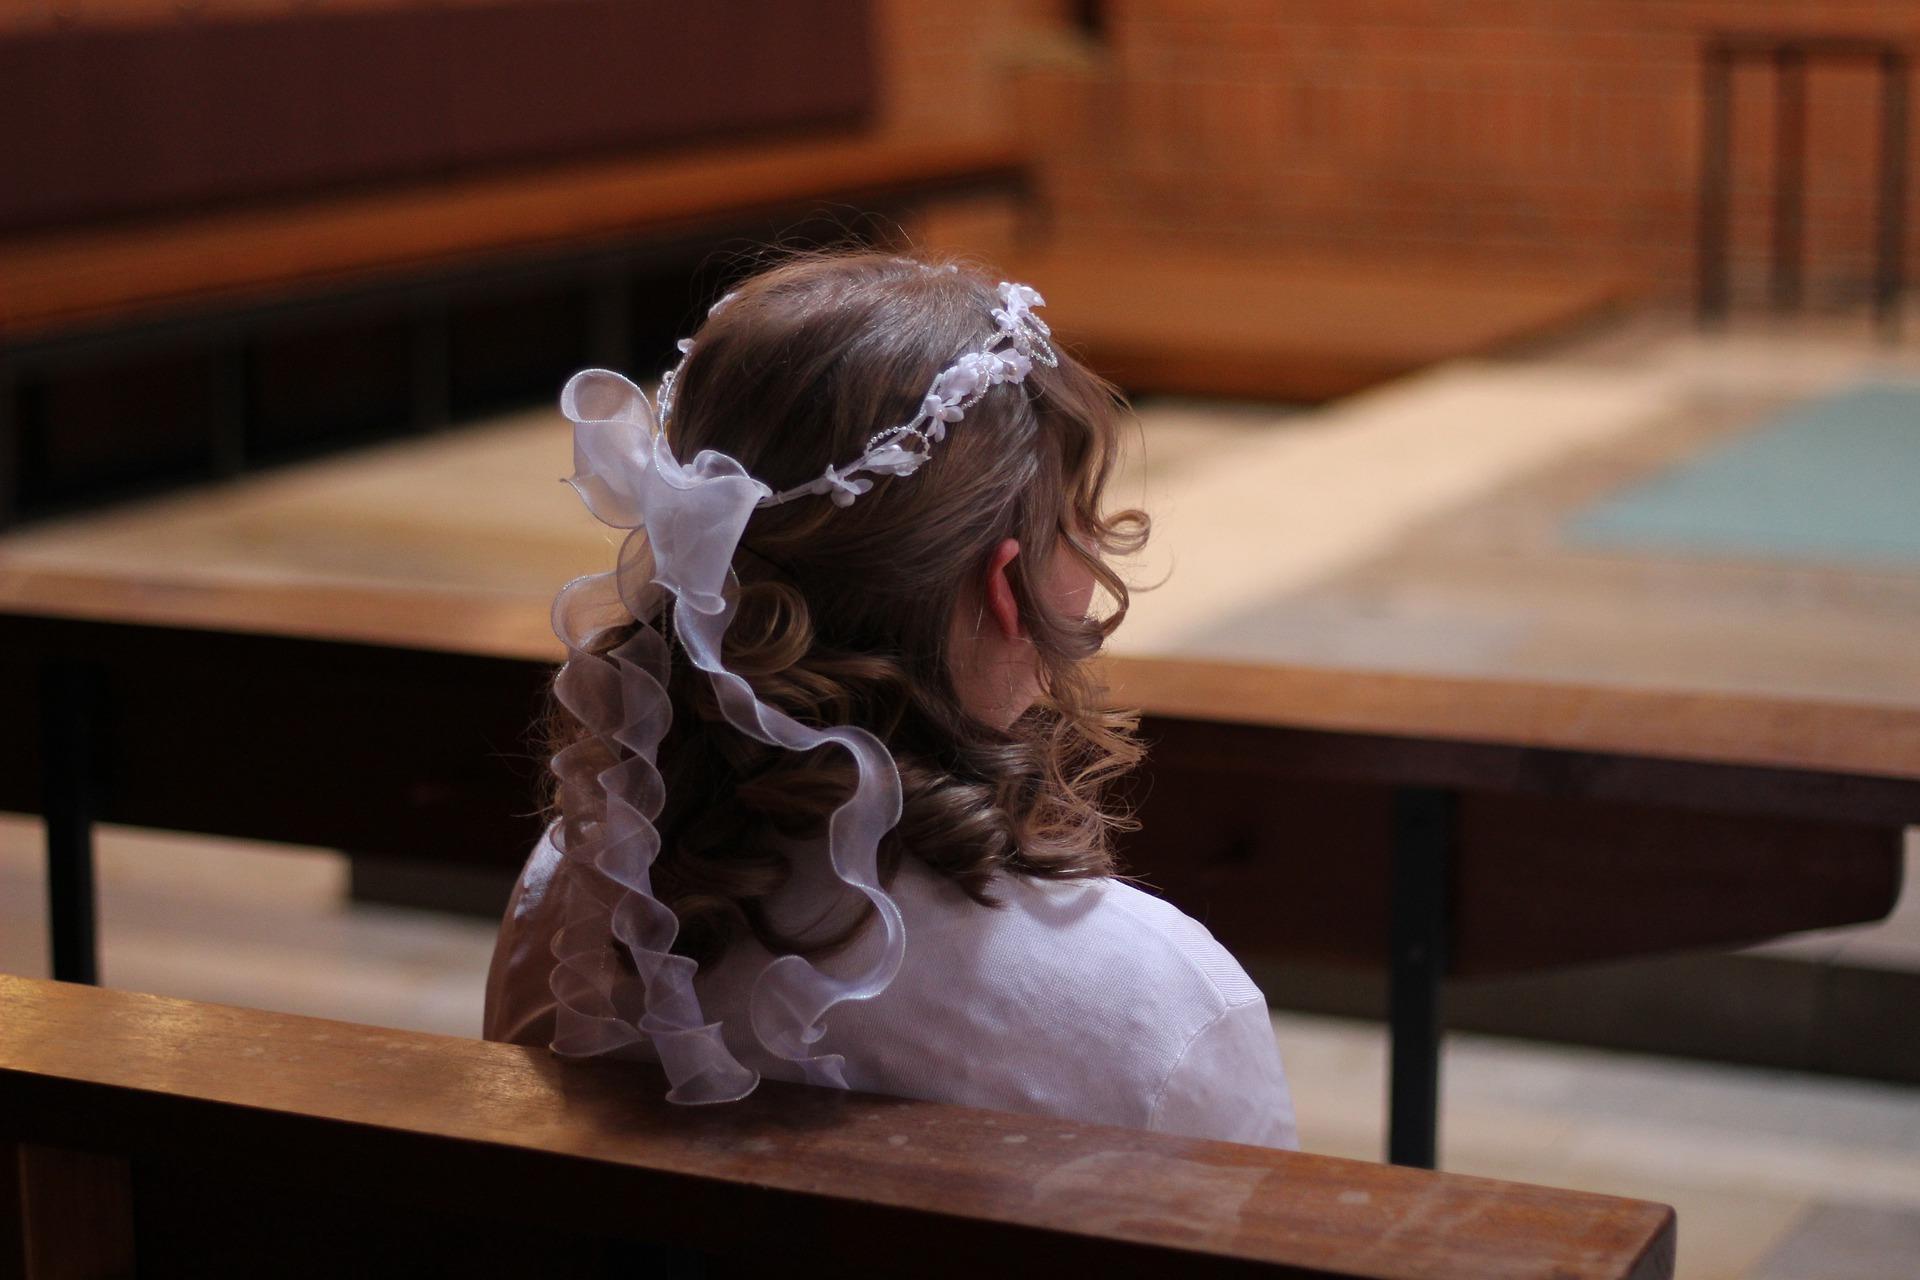 Bambina seduta in chiesa per la Santa Cresima